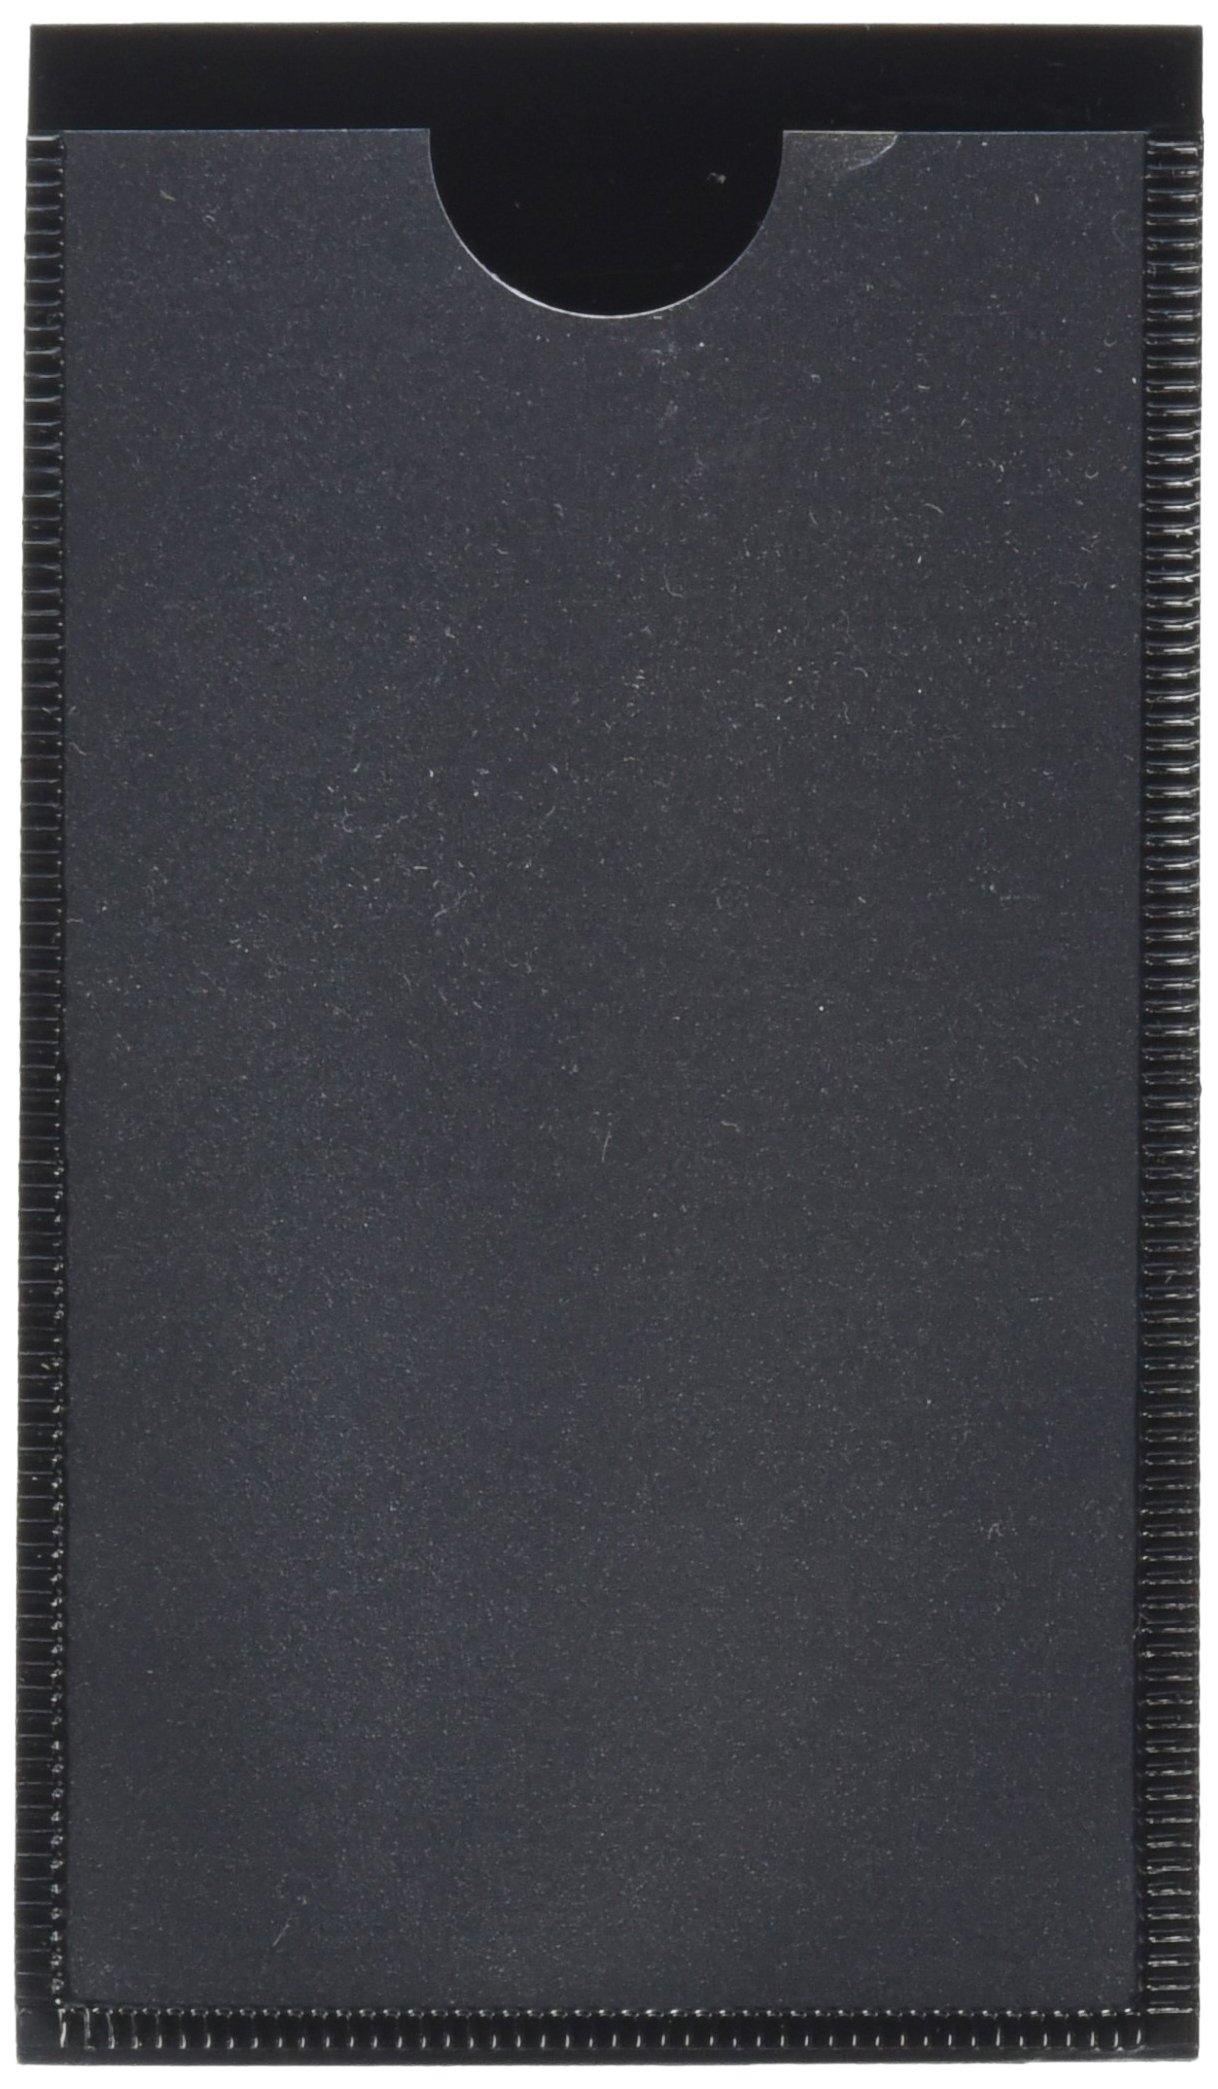 Panter Company MAG-LH-BK Magnetic label holders, 4-1/4 x 2-1/2, black, 10/pack